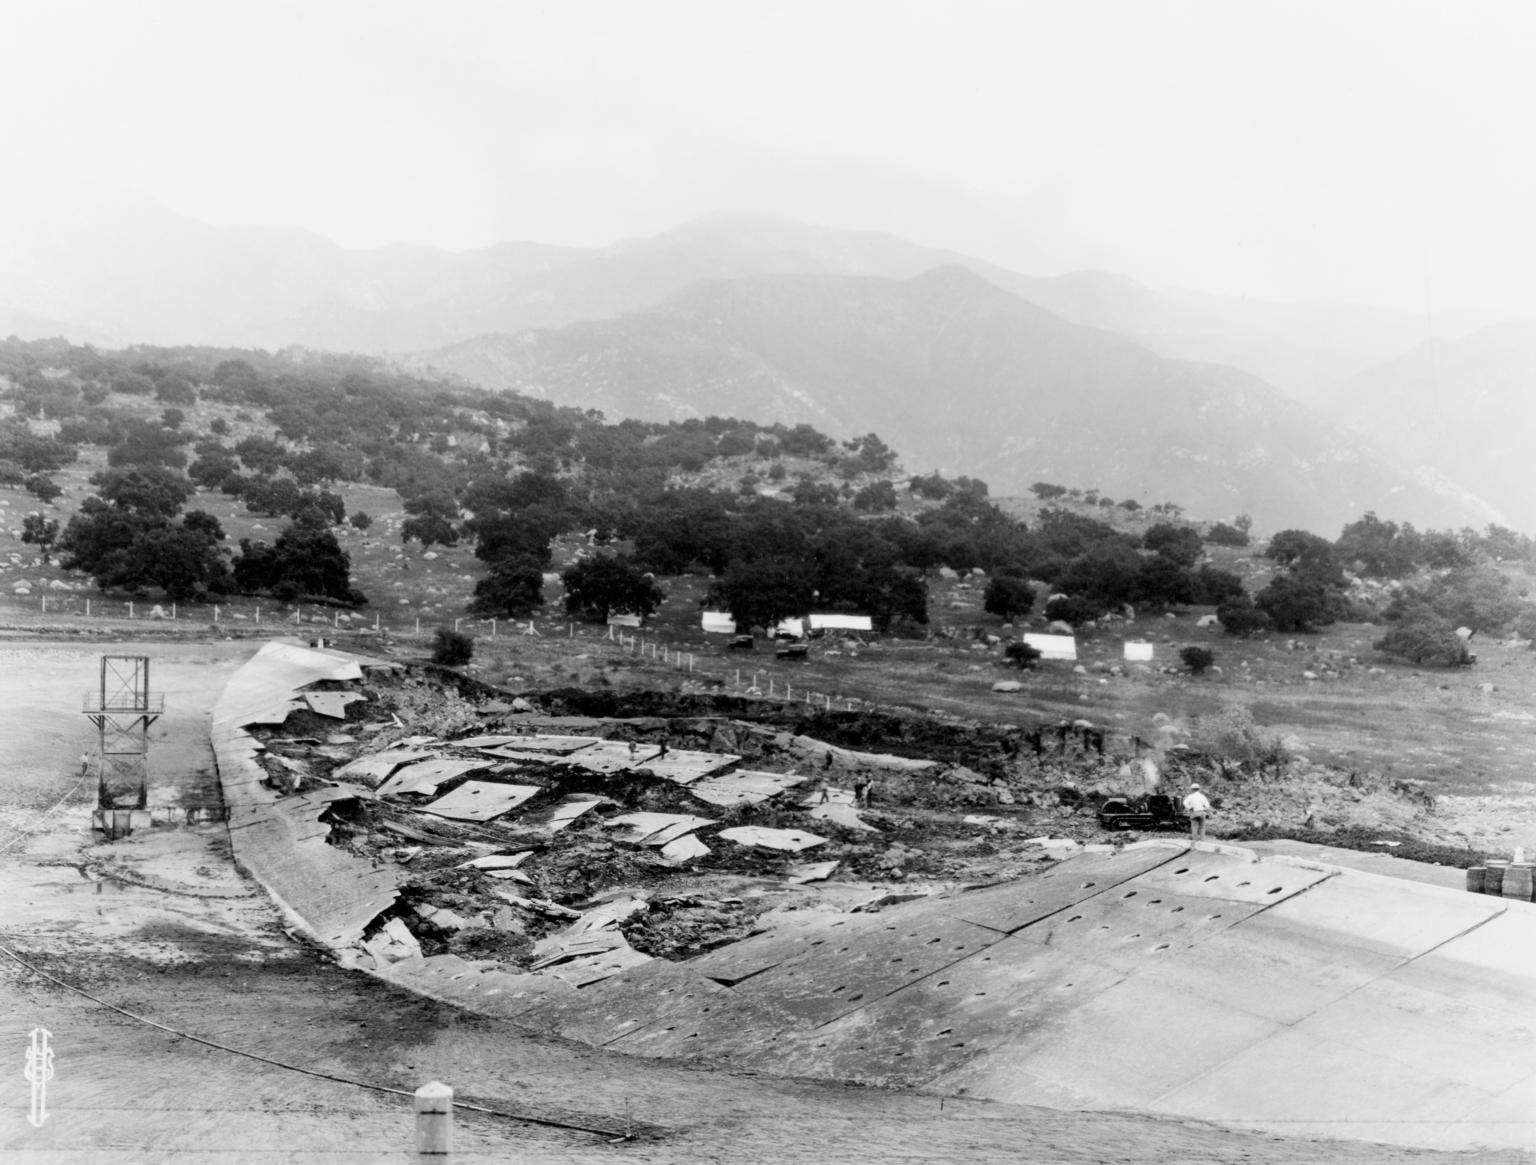 Santa Barbara 1925 Earthquake Damage - Reservoir